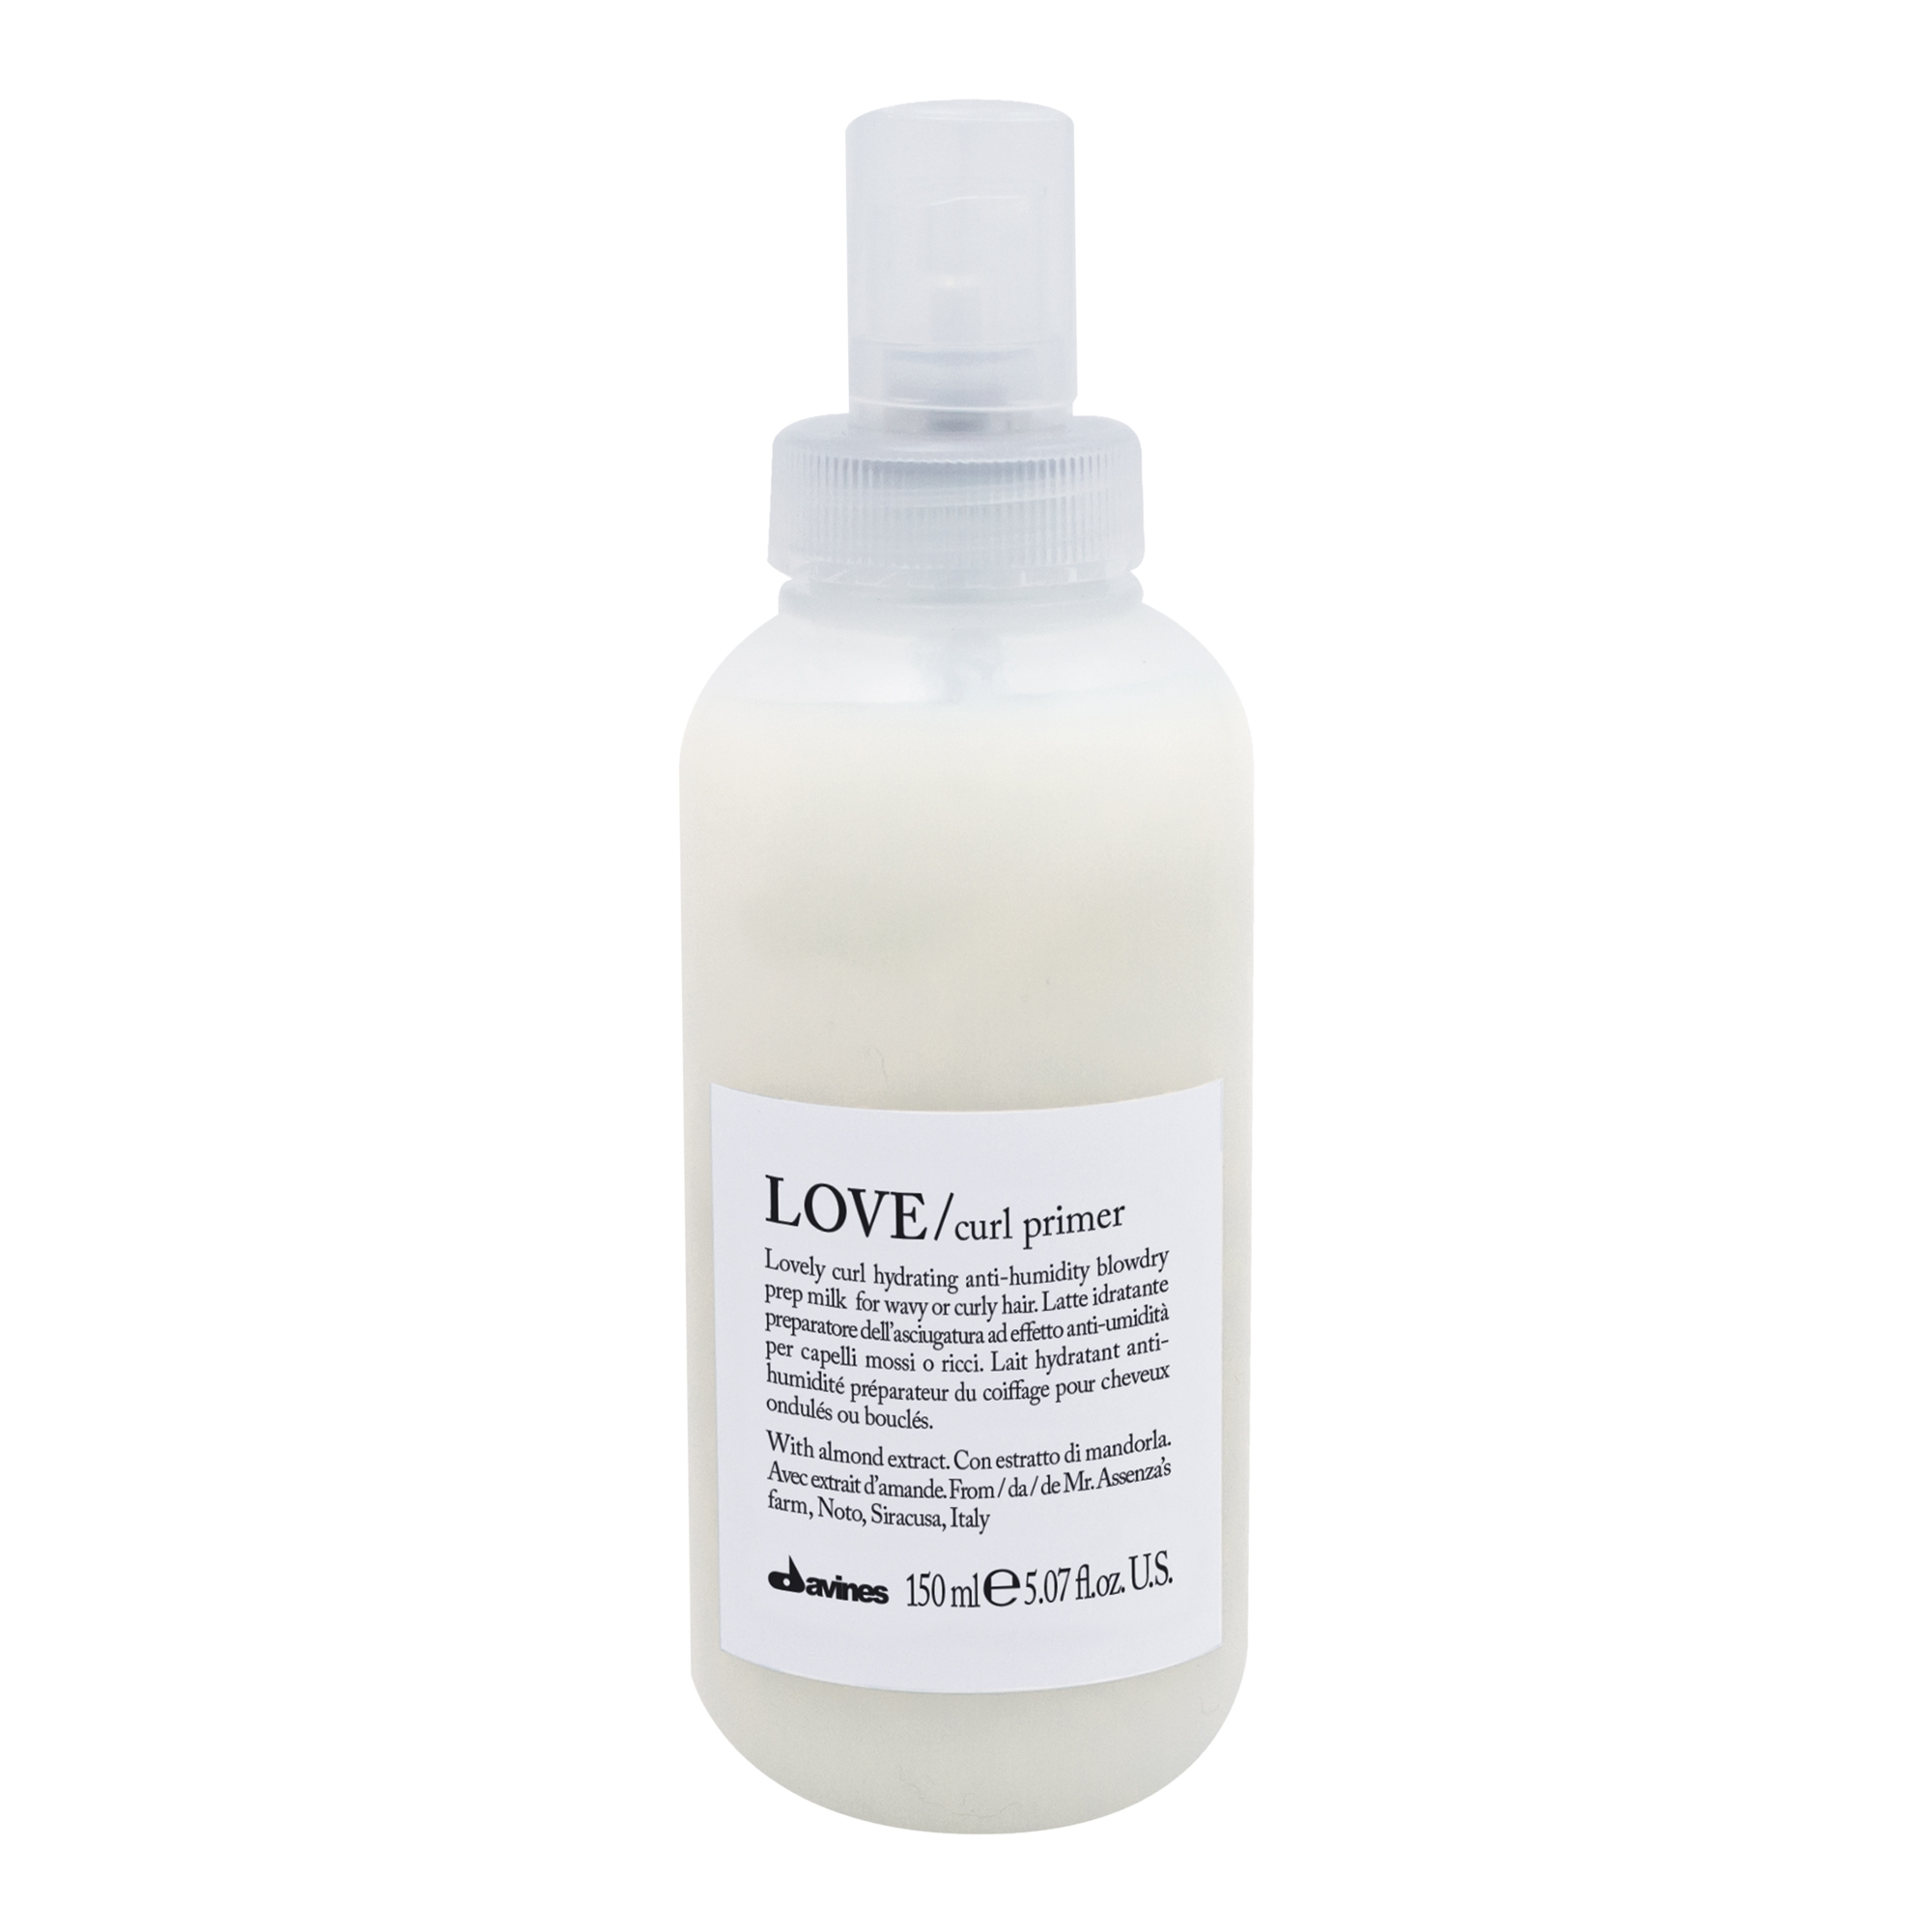 Davines Праймер для Усиления Завитка Love Curl, 150 мл davines контроллер для усиления завитка love curl 150 мл